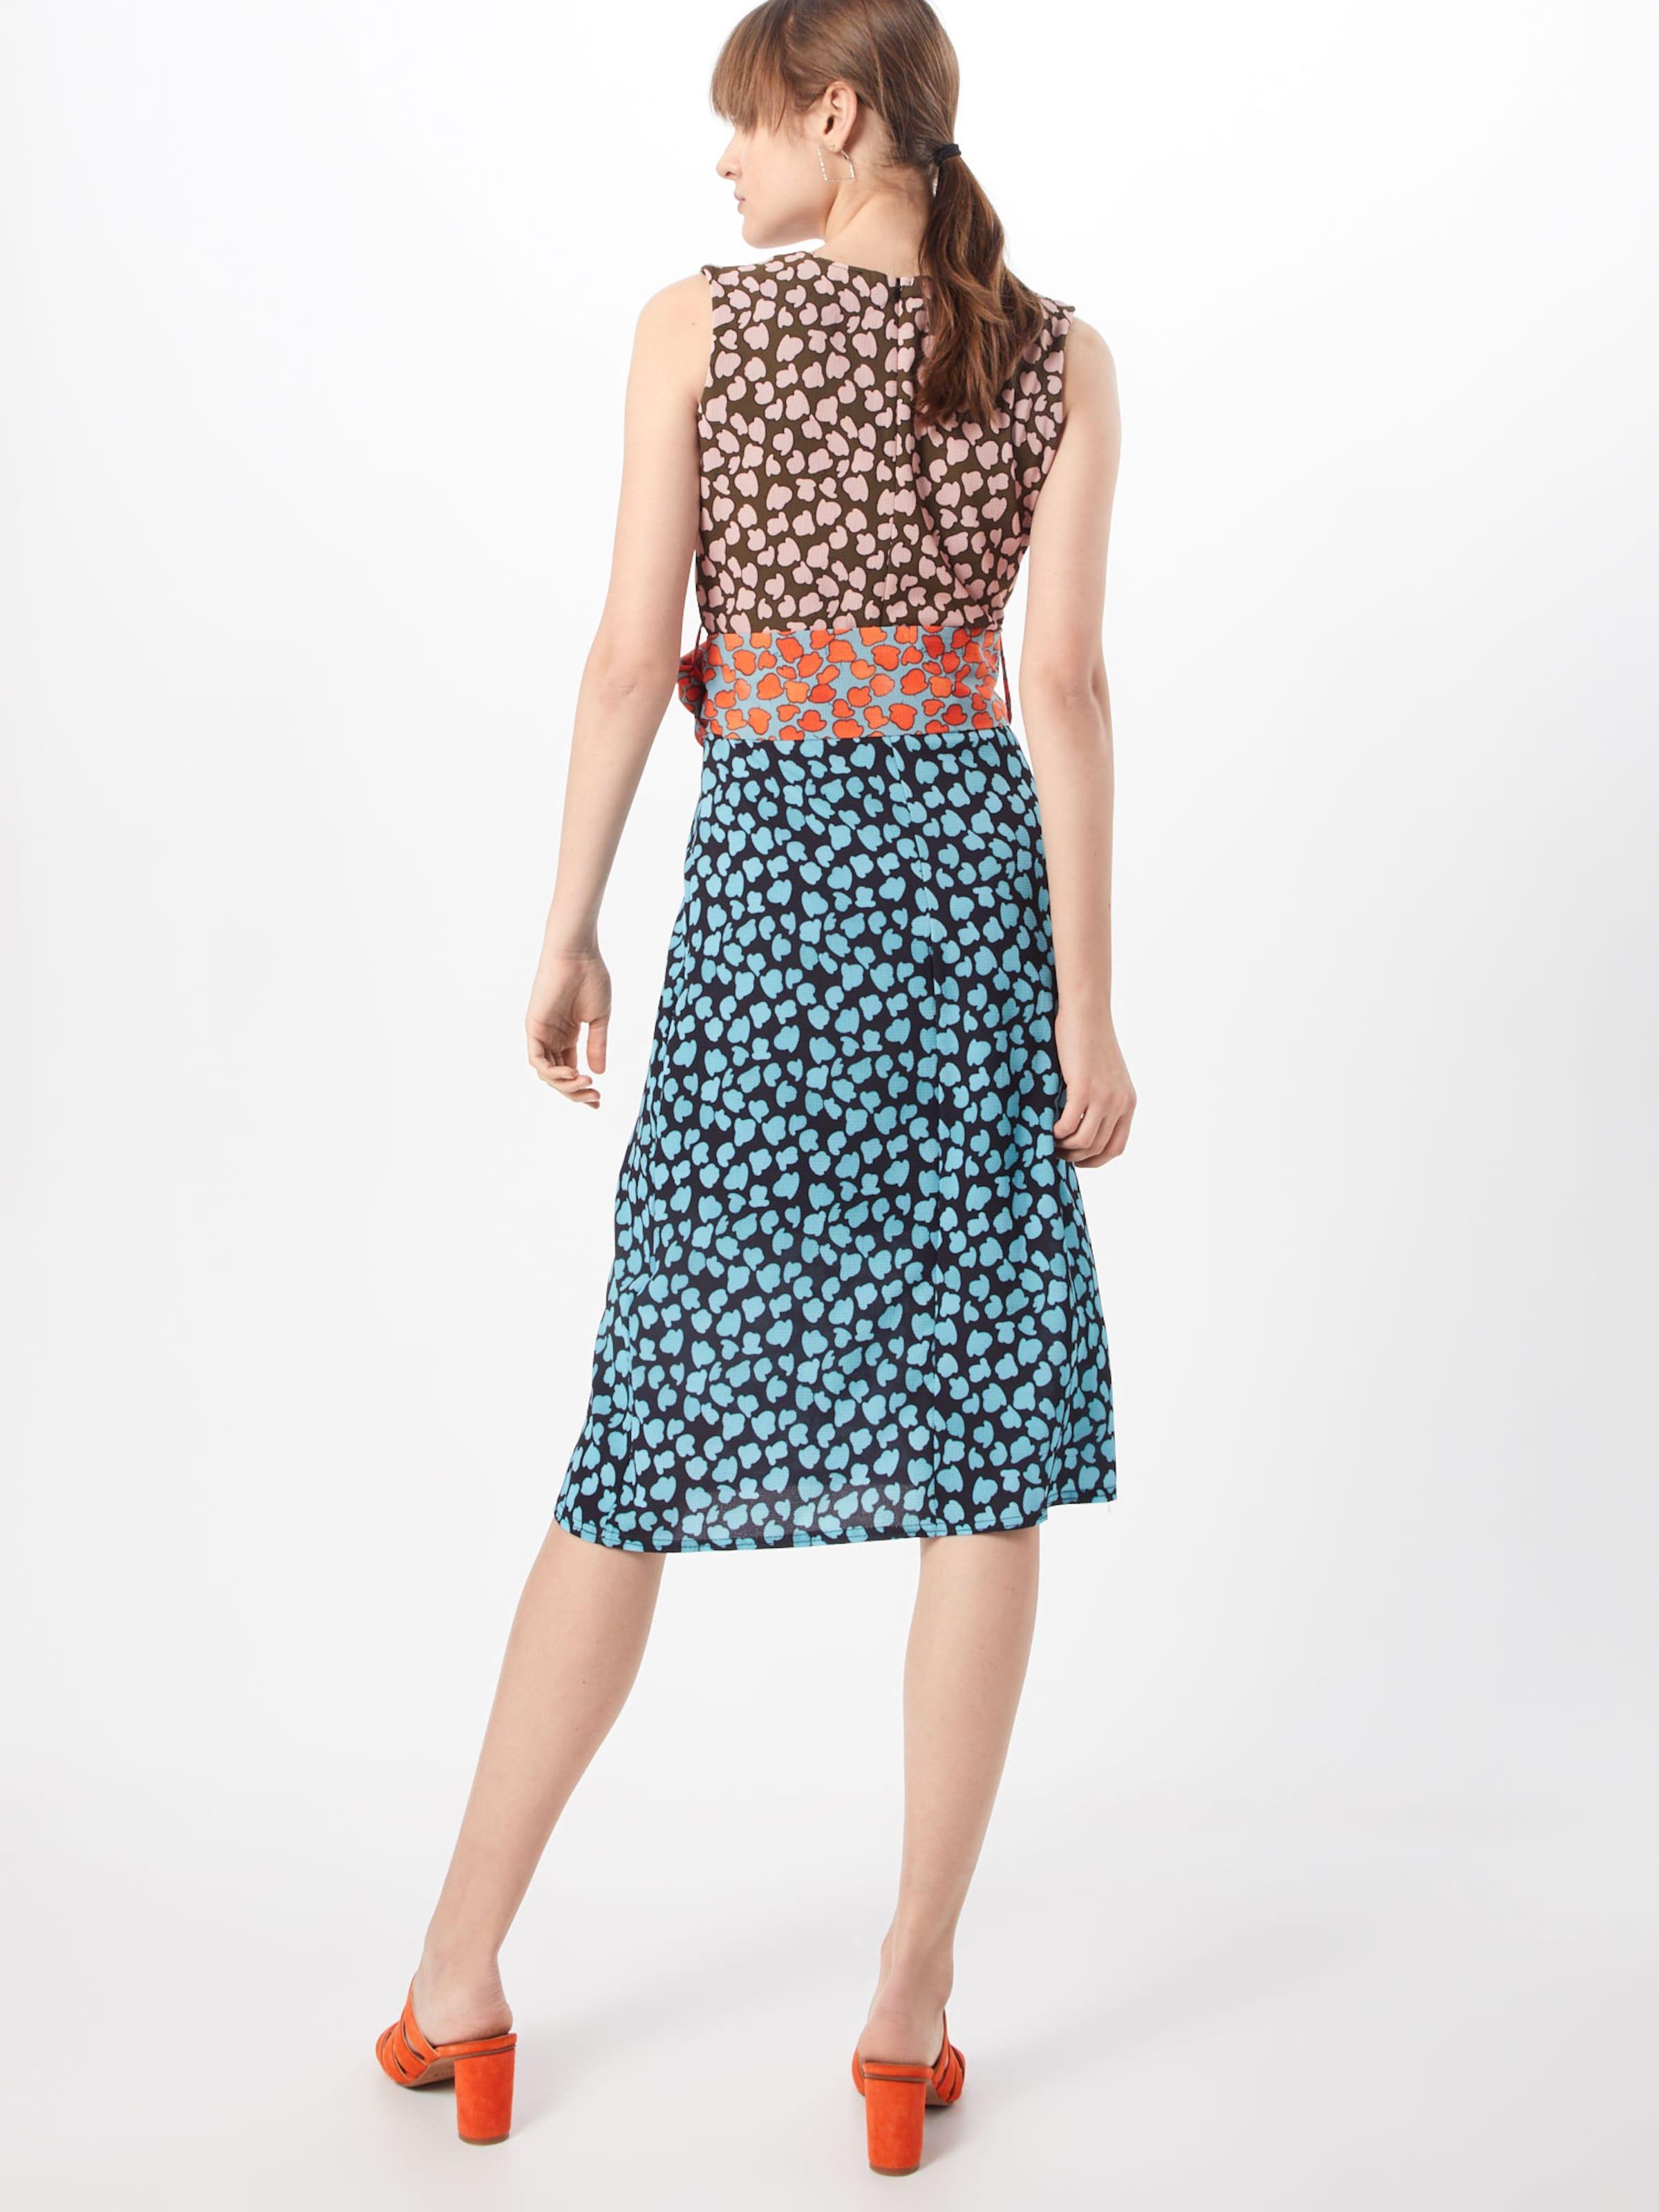 Lost Mix Robe BleuOrange Ink 'column Dress Print' In En OTPkXiwZu